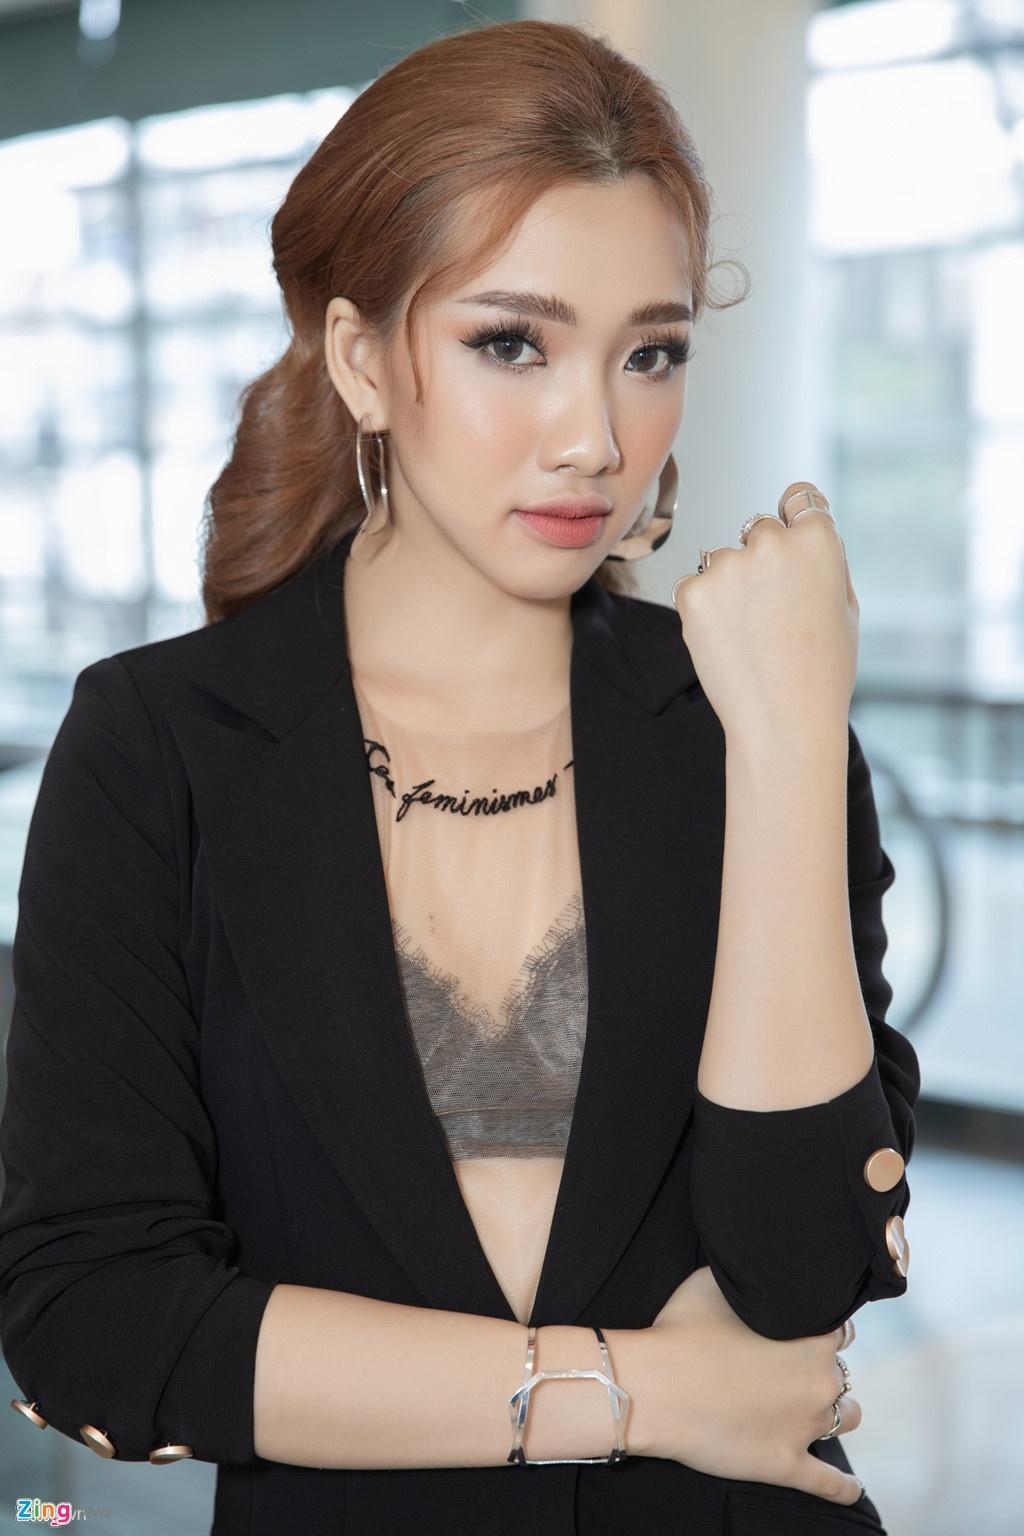 Hot girl Viet ra mat tai Kpop: 'Dau long khi doc binh luan che bai' hinh anh 2